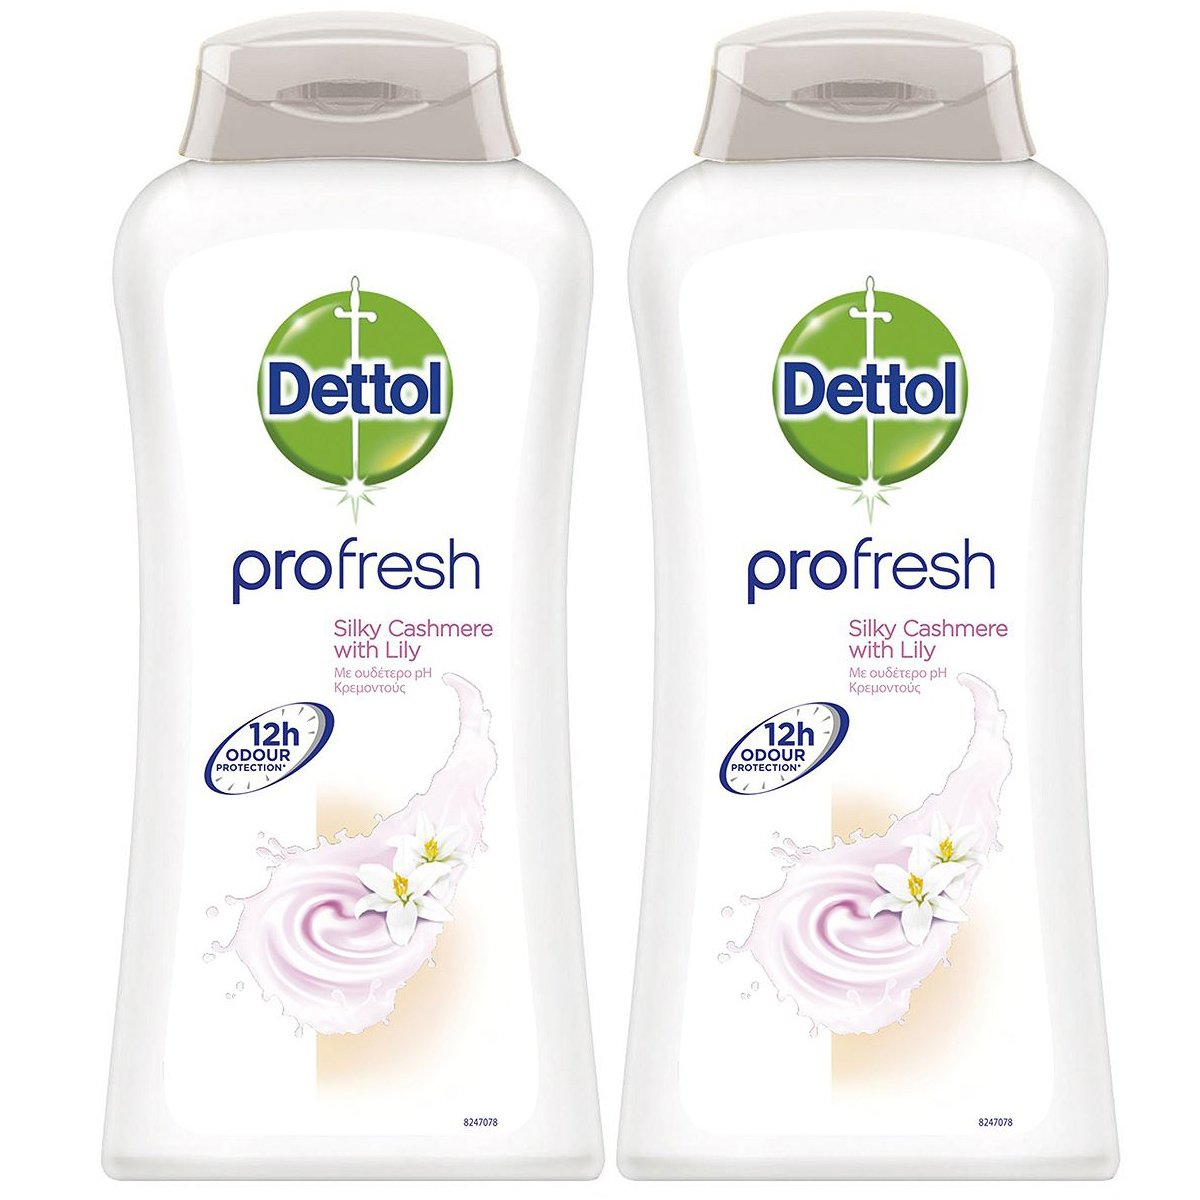 Dettol Profresh Silky Cashmere Δροσερό Κρεμοντούς με Ουδέτερο Ph, Προστασία Ενάντια στα Βακτηρίδια 2x500ml 1+1 Δώρο